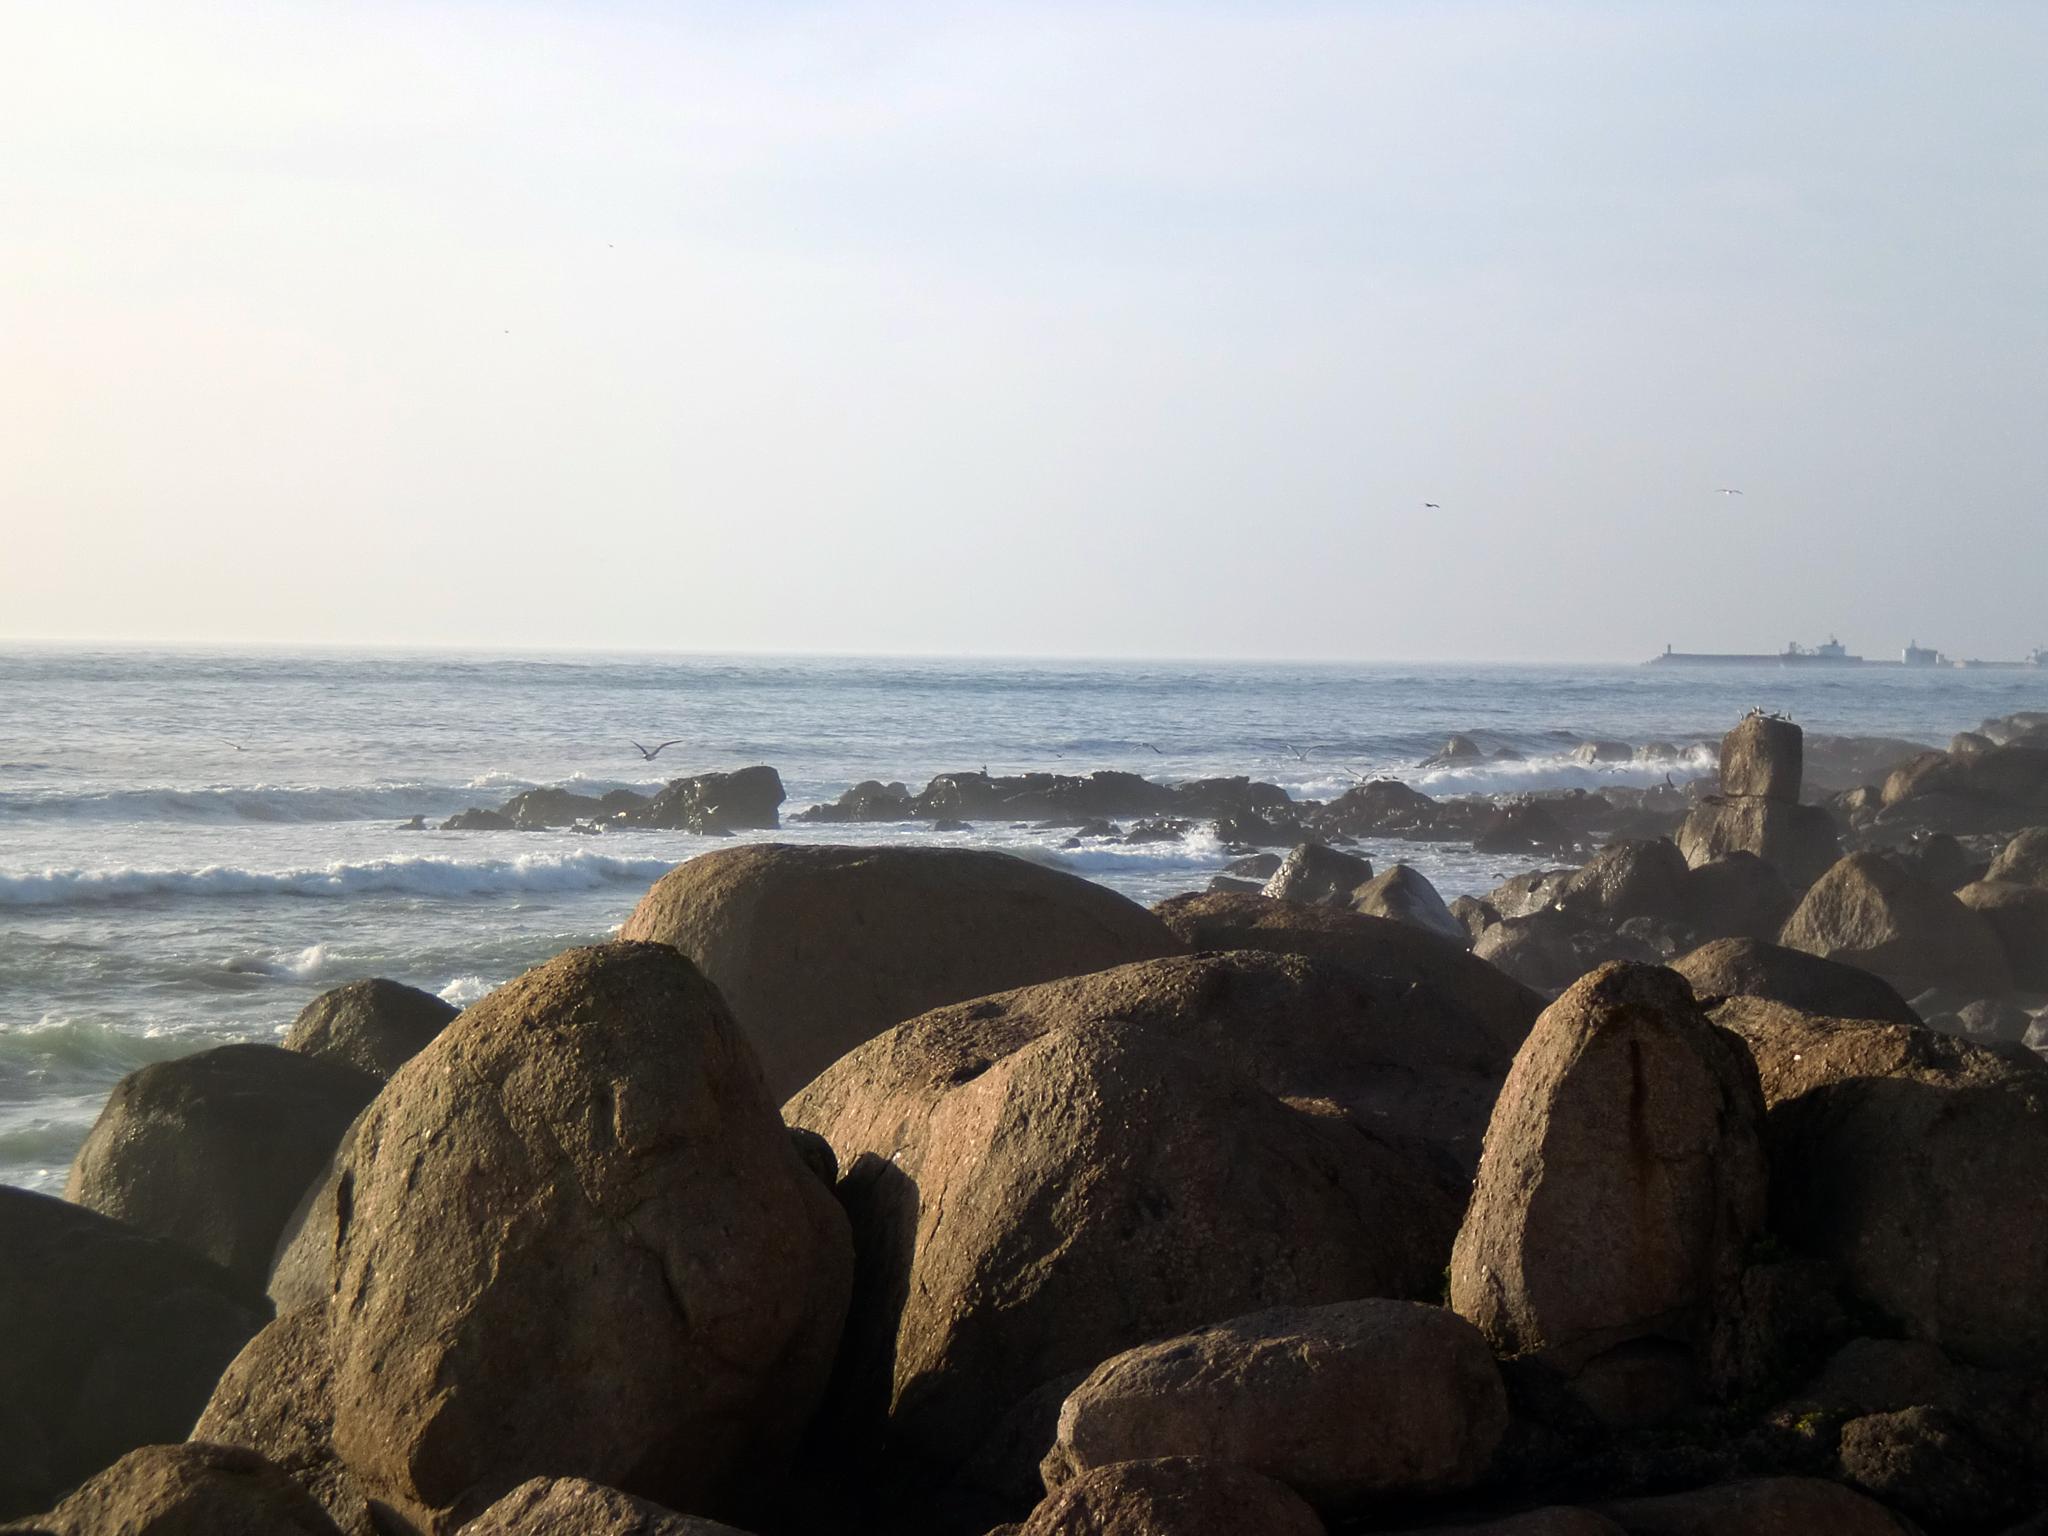 Stones on the beach by Fernando